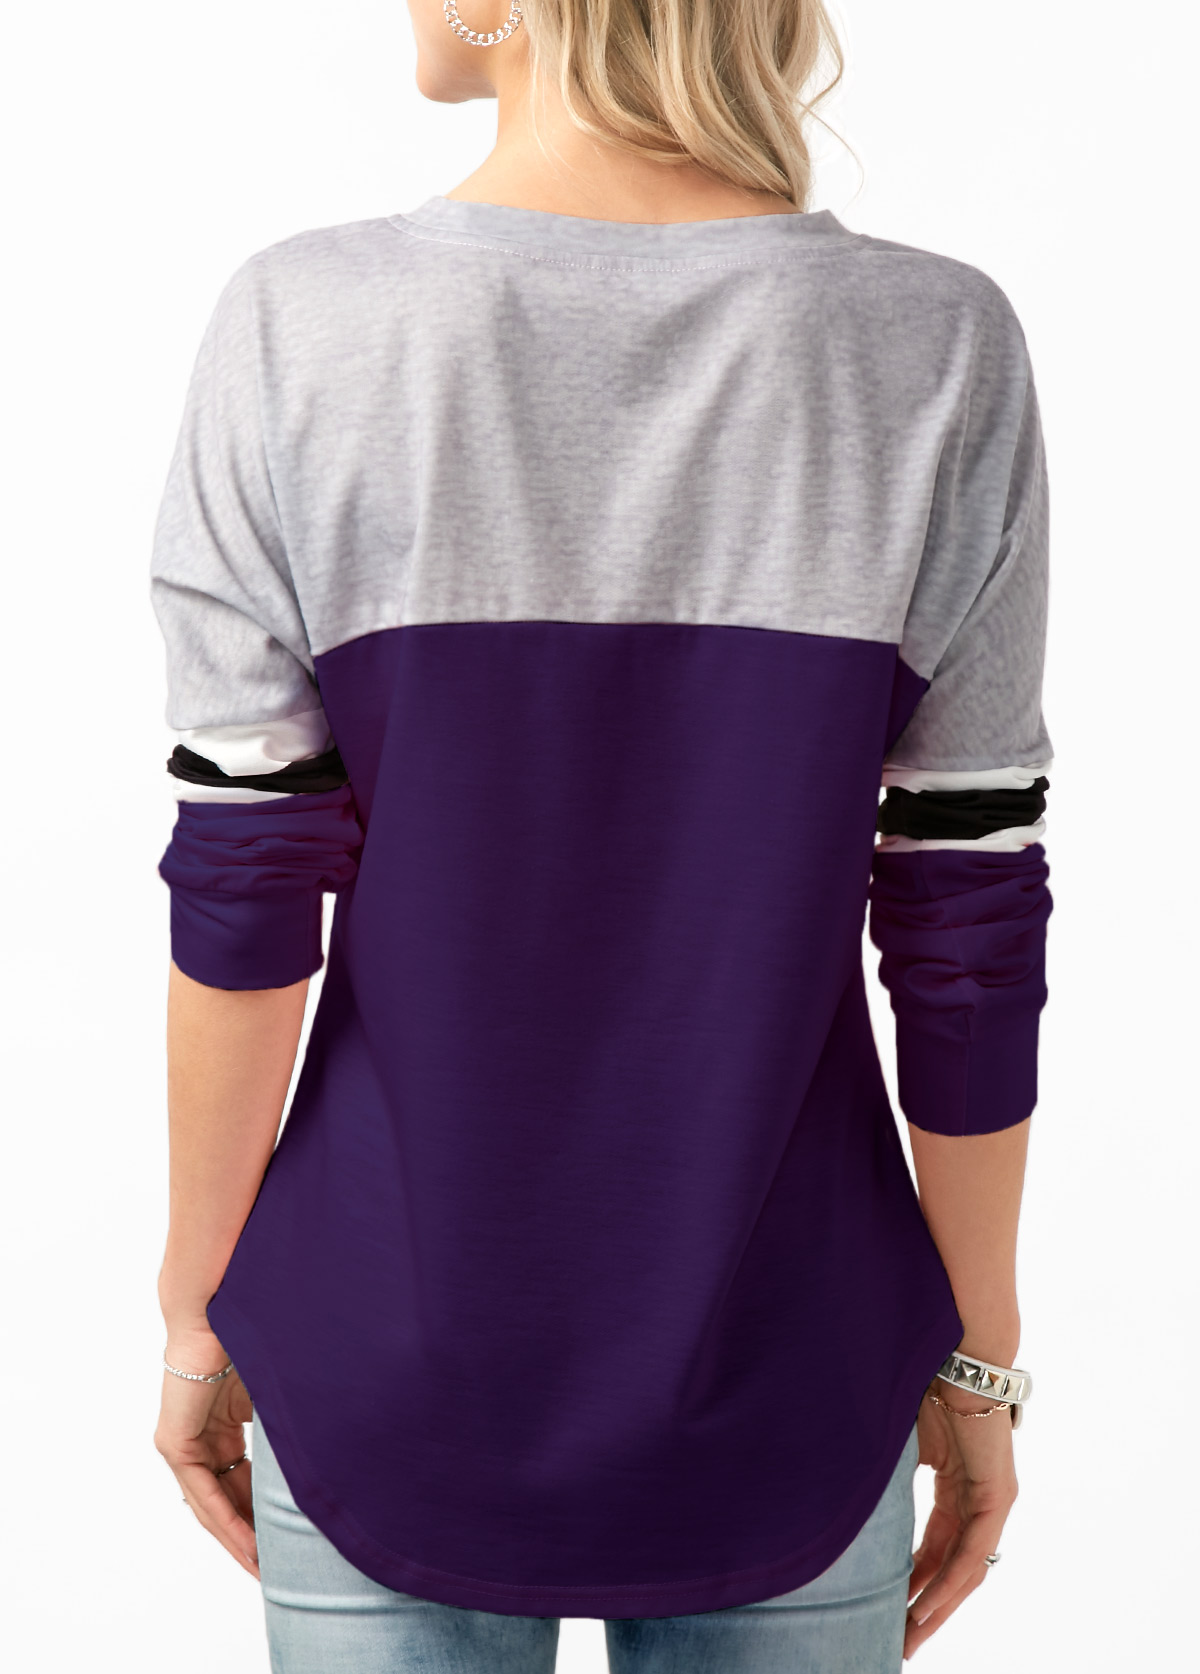 Lace Up Contrast Long Sleeve Sweatshirt